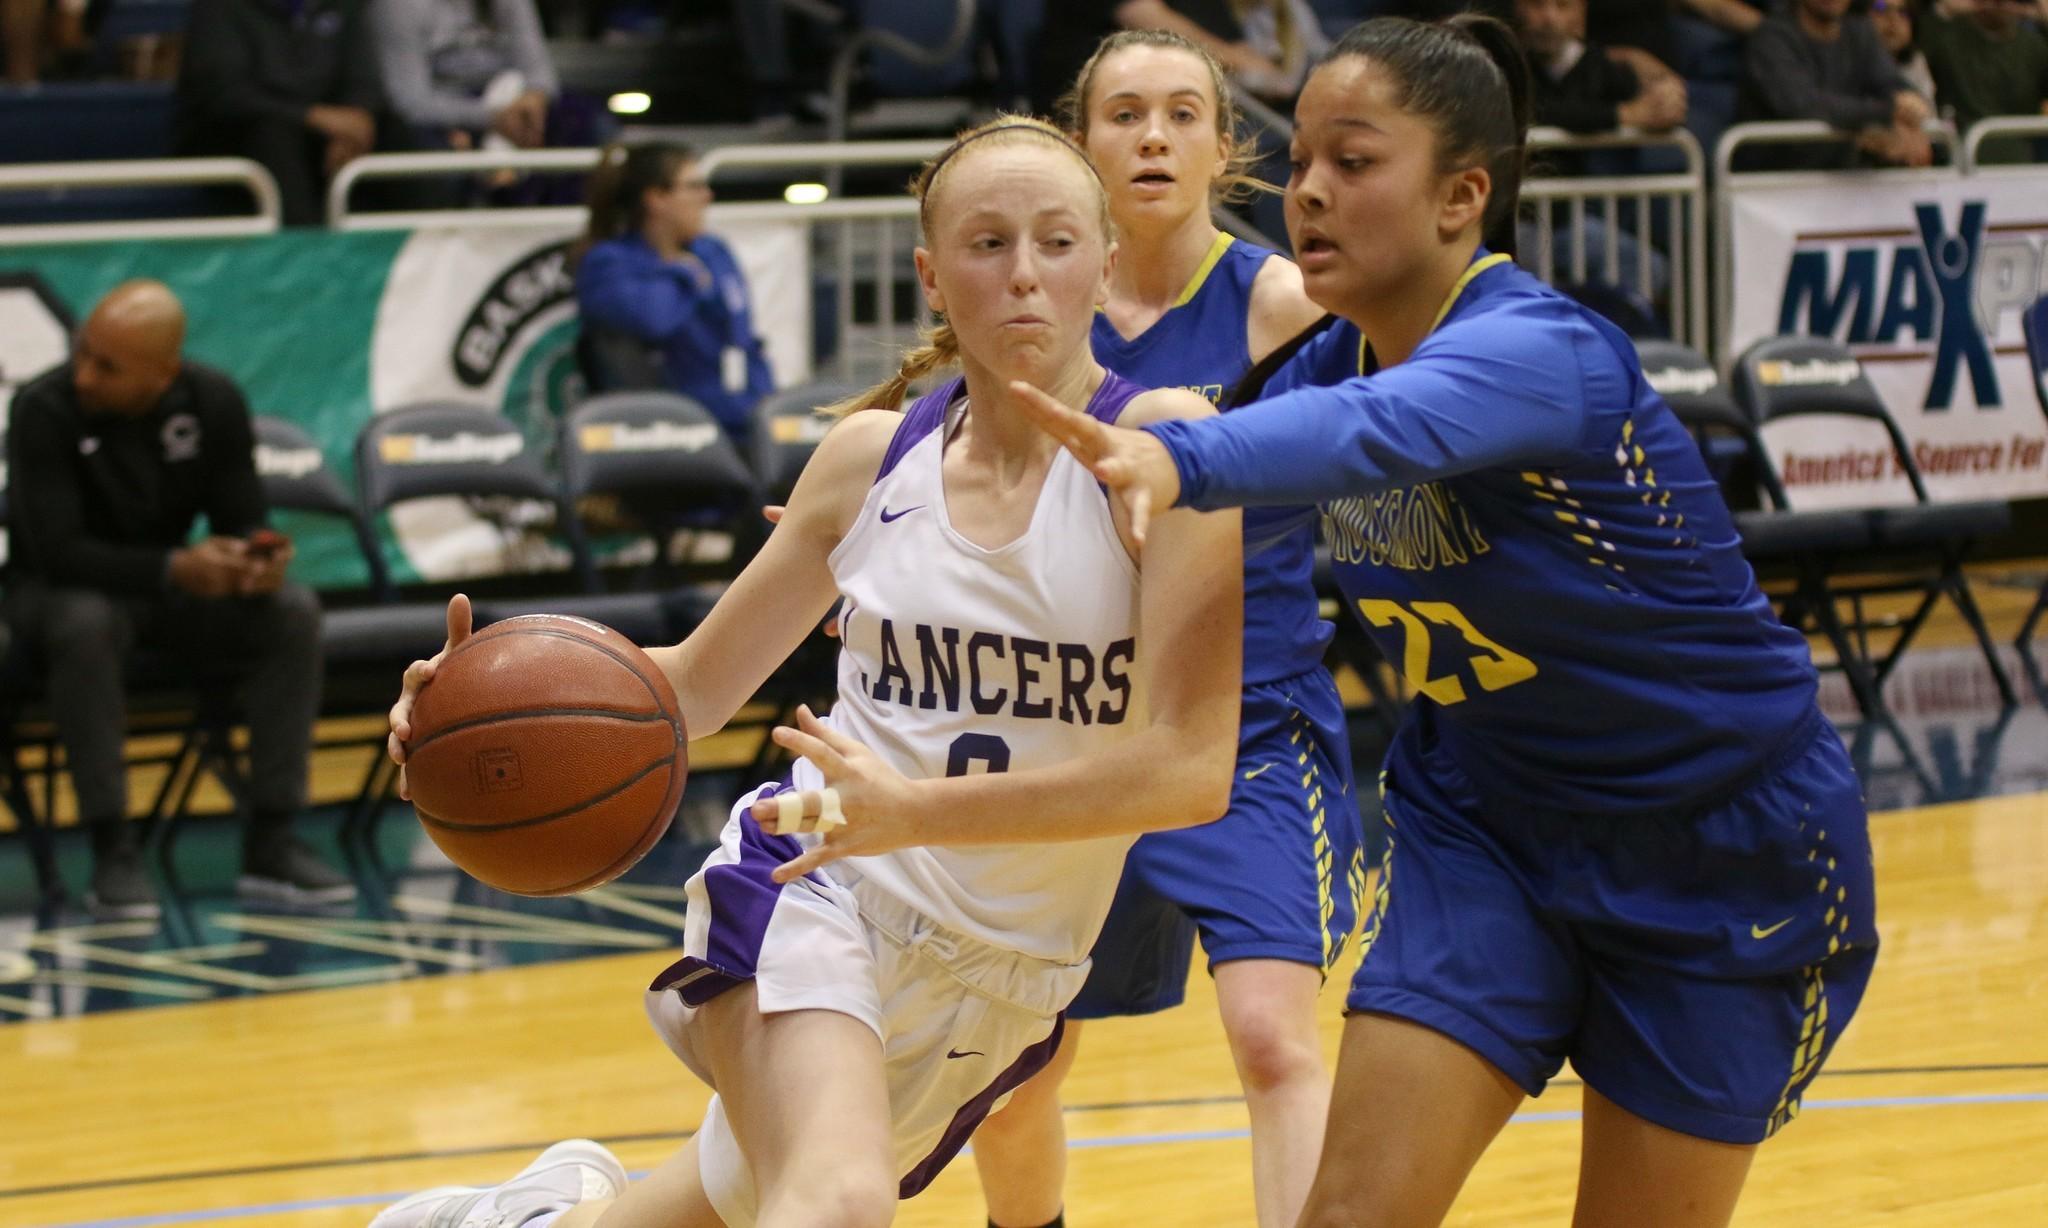 Freshman Alexa Mikeska led the Lancers with 20 pts.